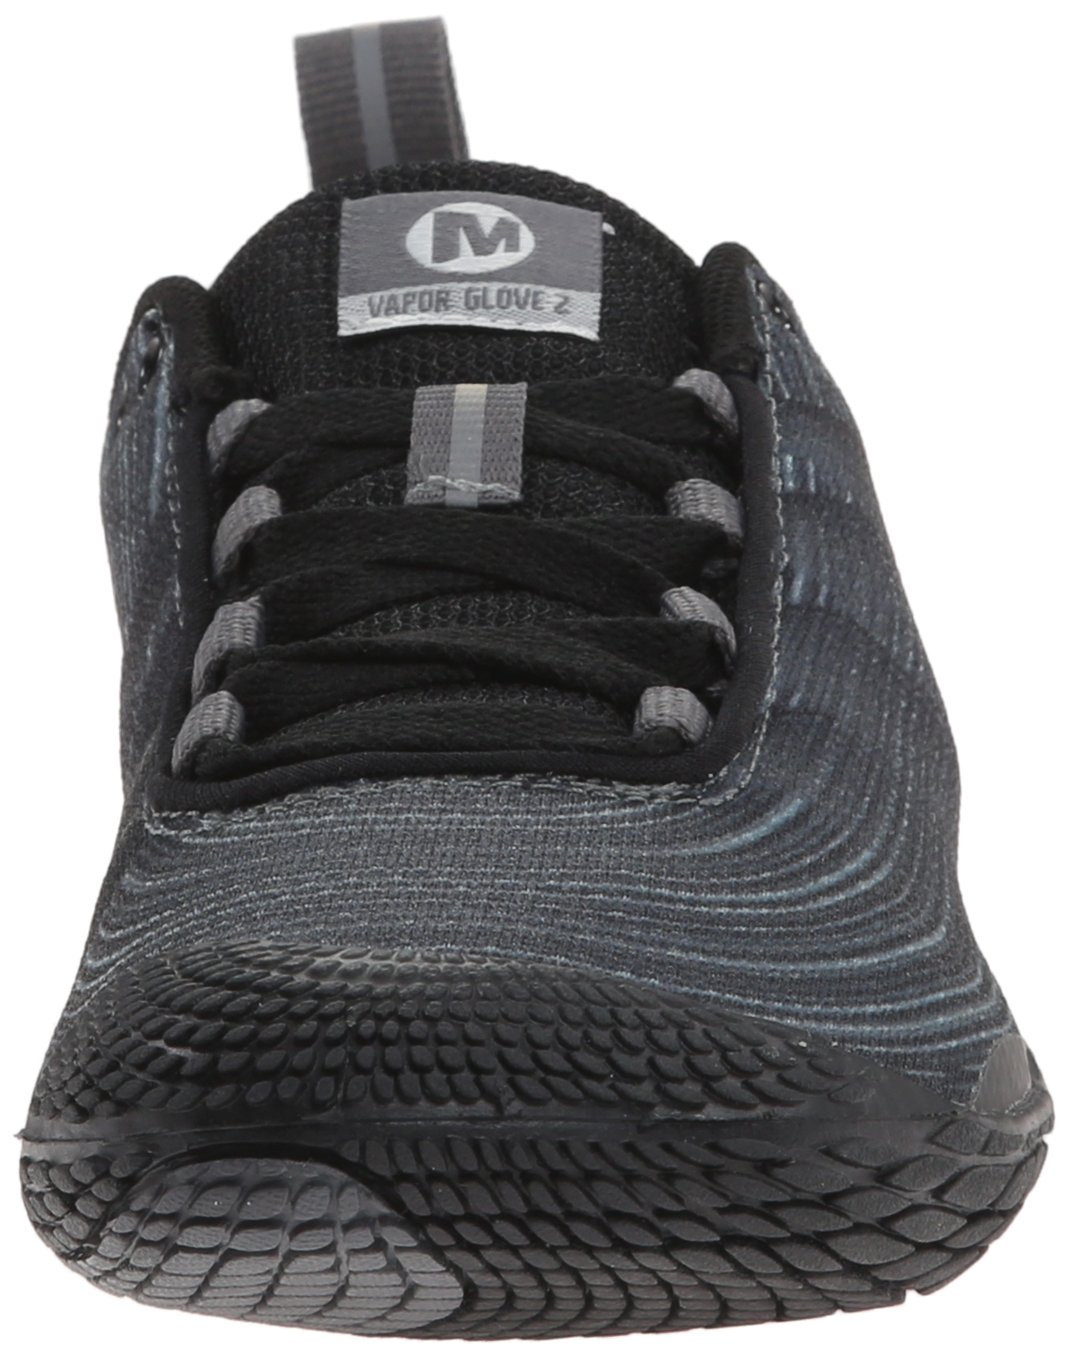 Merrell Women's Vapor Glove 2 Barefoot Trail Running Shoe B00RDL3W5Y 8.5 B(M) US|Black/Castle Rock